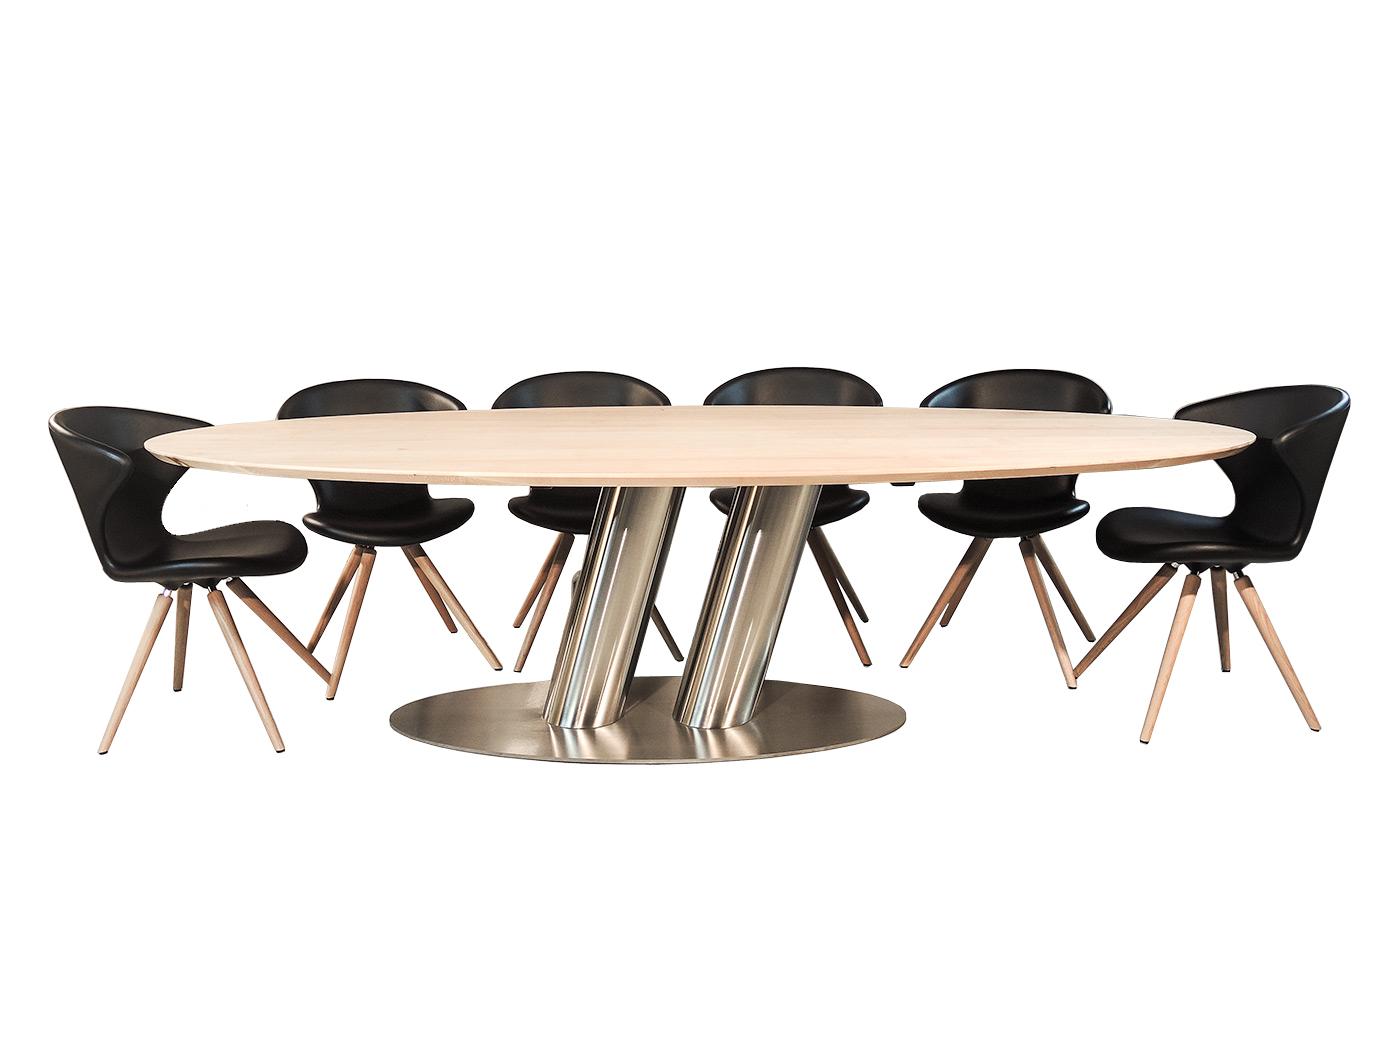 Ronde Eettafel 10 Personen.Puglia Grote Ovale Design Tafel